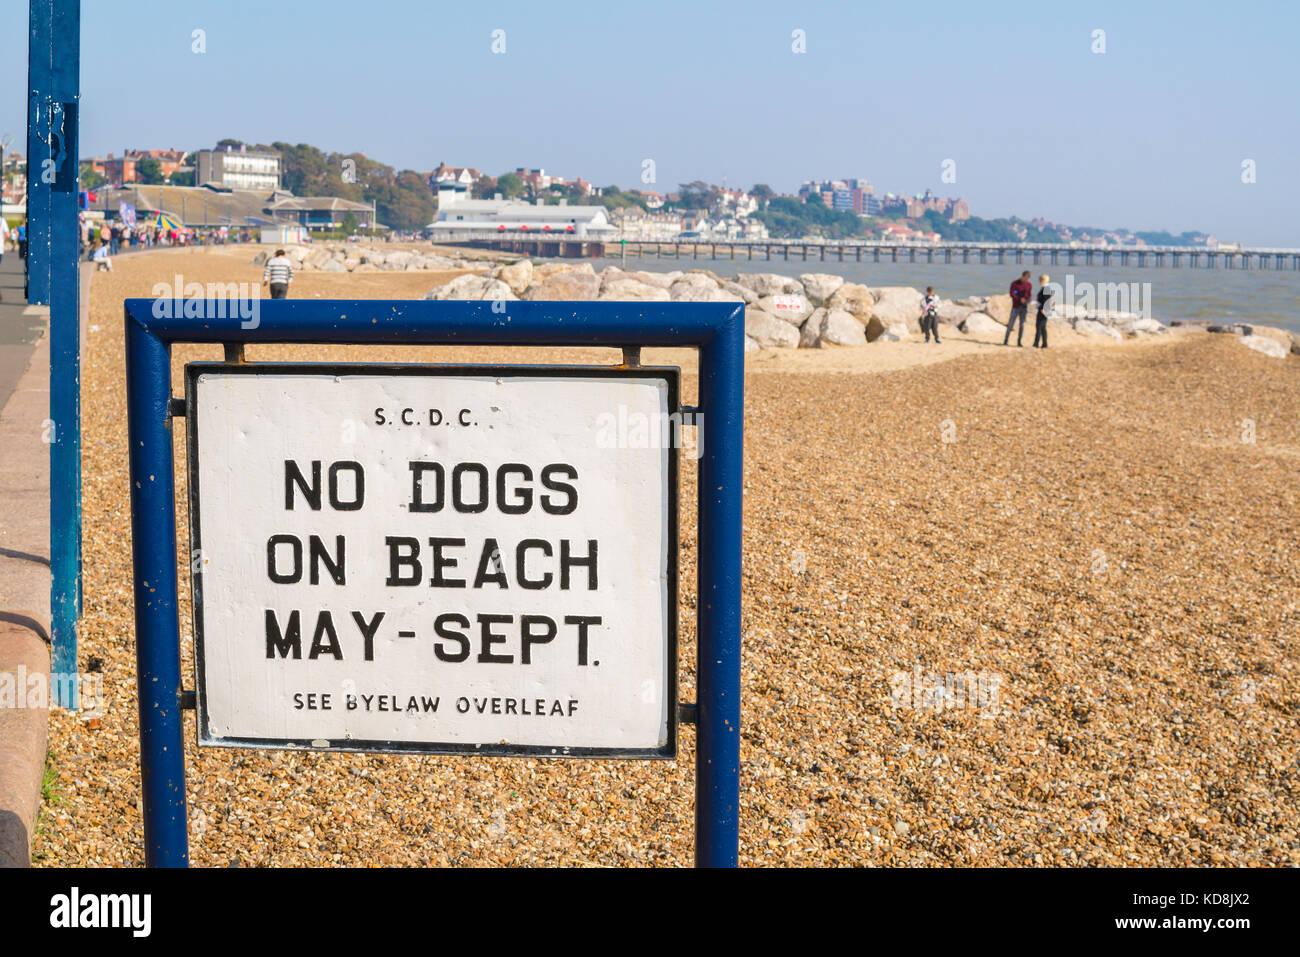 Felixstowe Suffolk beach UK, sign on Felixstowe beach prohibiting dogs during the summer season. - Stock Image